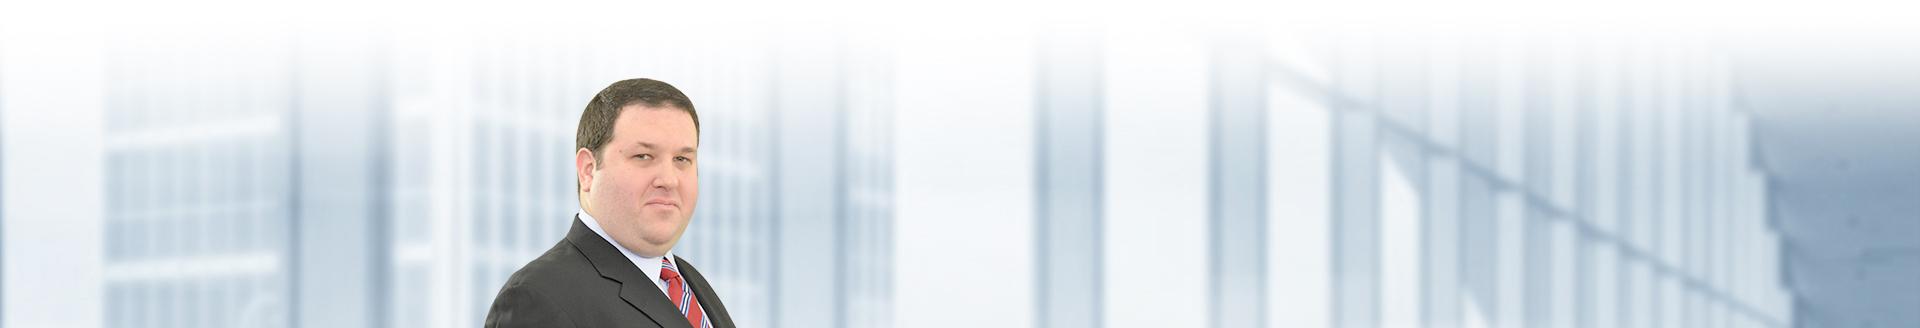 Aaron Schlanger - Osen LLC